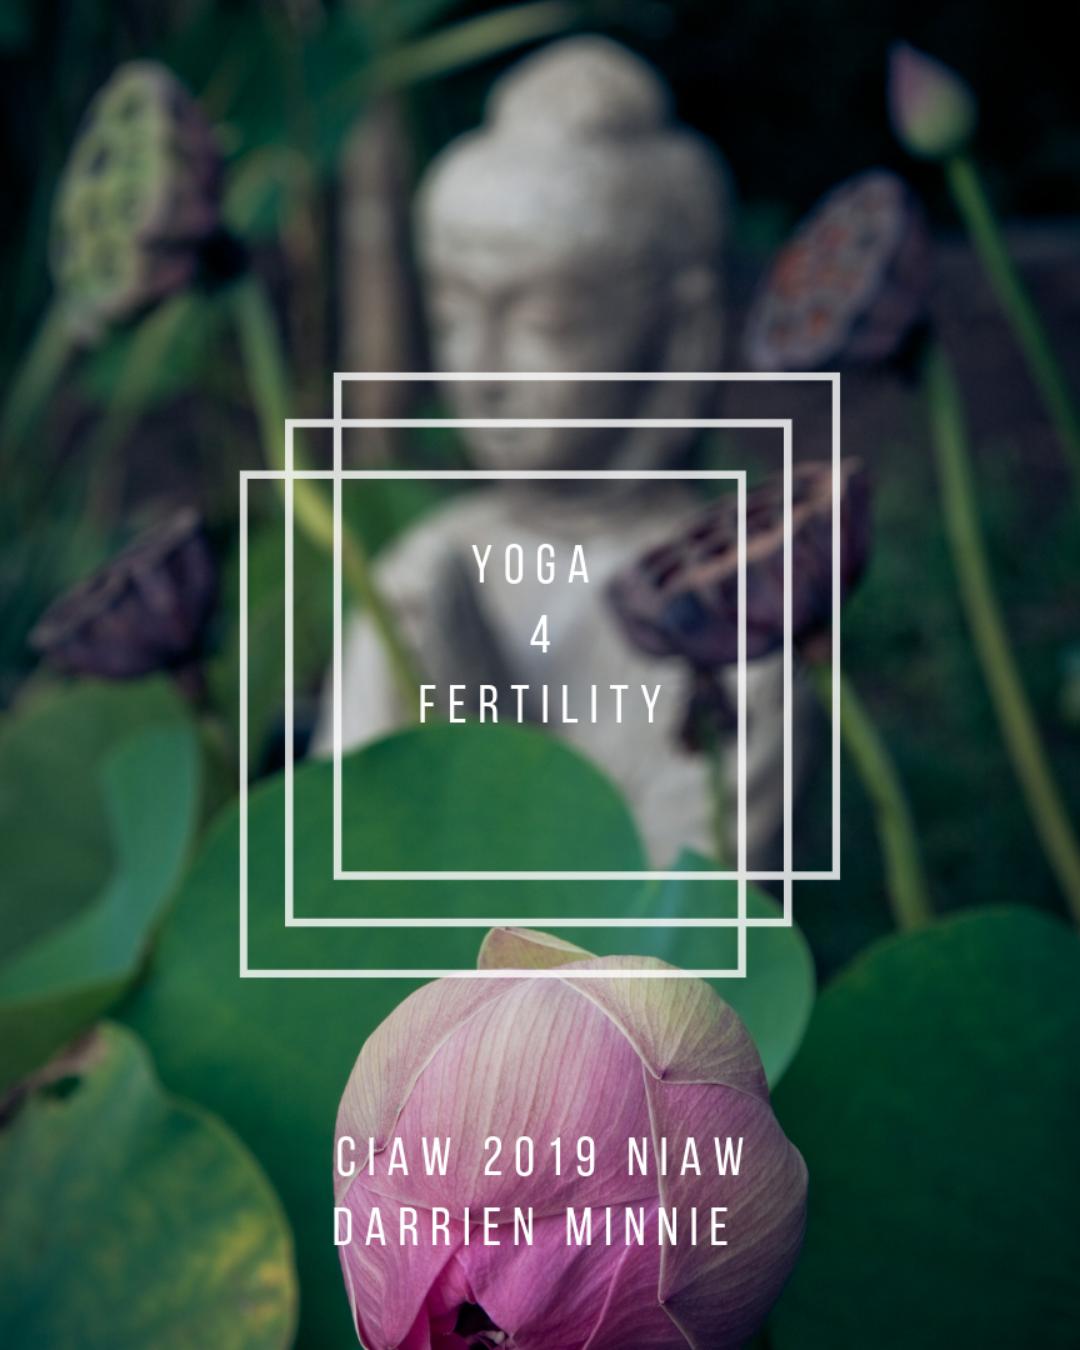 Yoga 4 Fertility - @sunsetstudiopg @darrien_minnie_fertility #yogaforfertility #Fertilityyoga #chakrahealing#yoganidra #sunsetstudiosyoga#yogaprincegeorge #fertilityjourney#fertilitywarrior #infertilitysucks